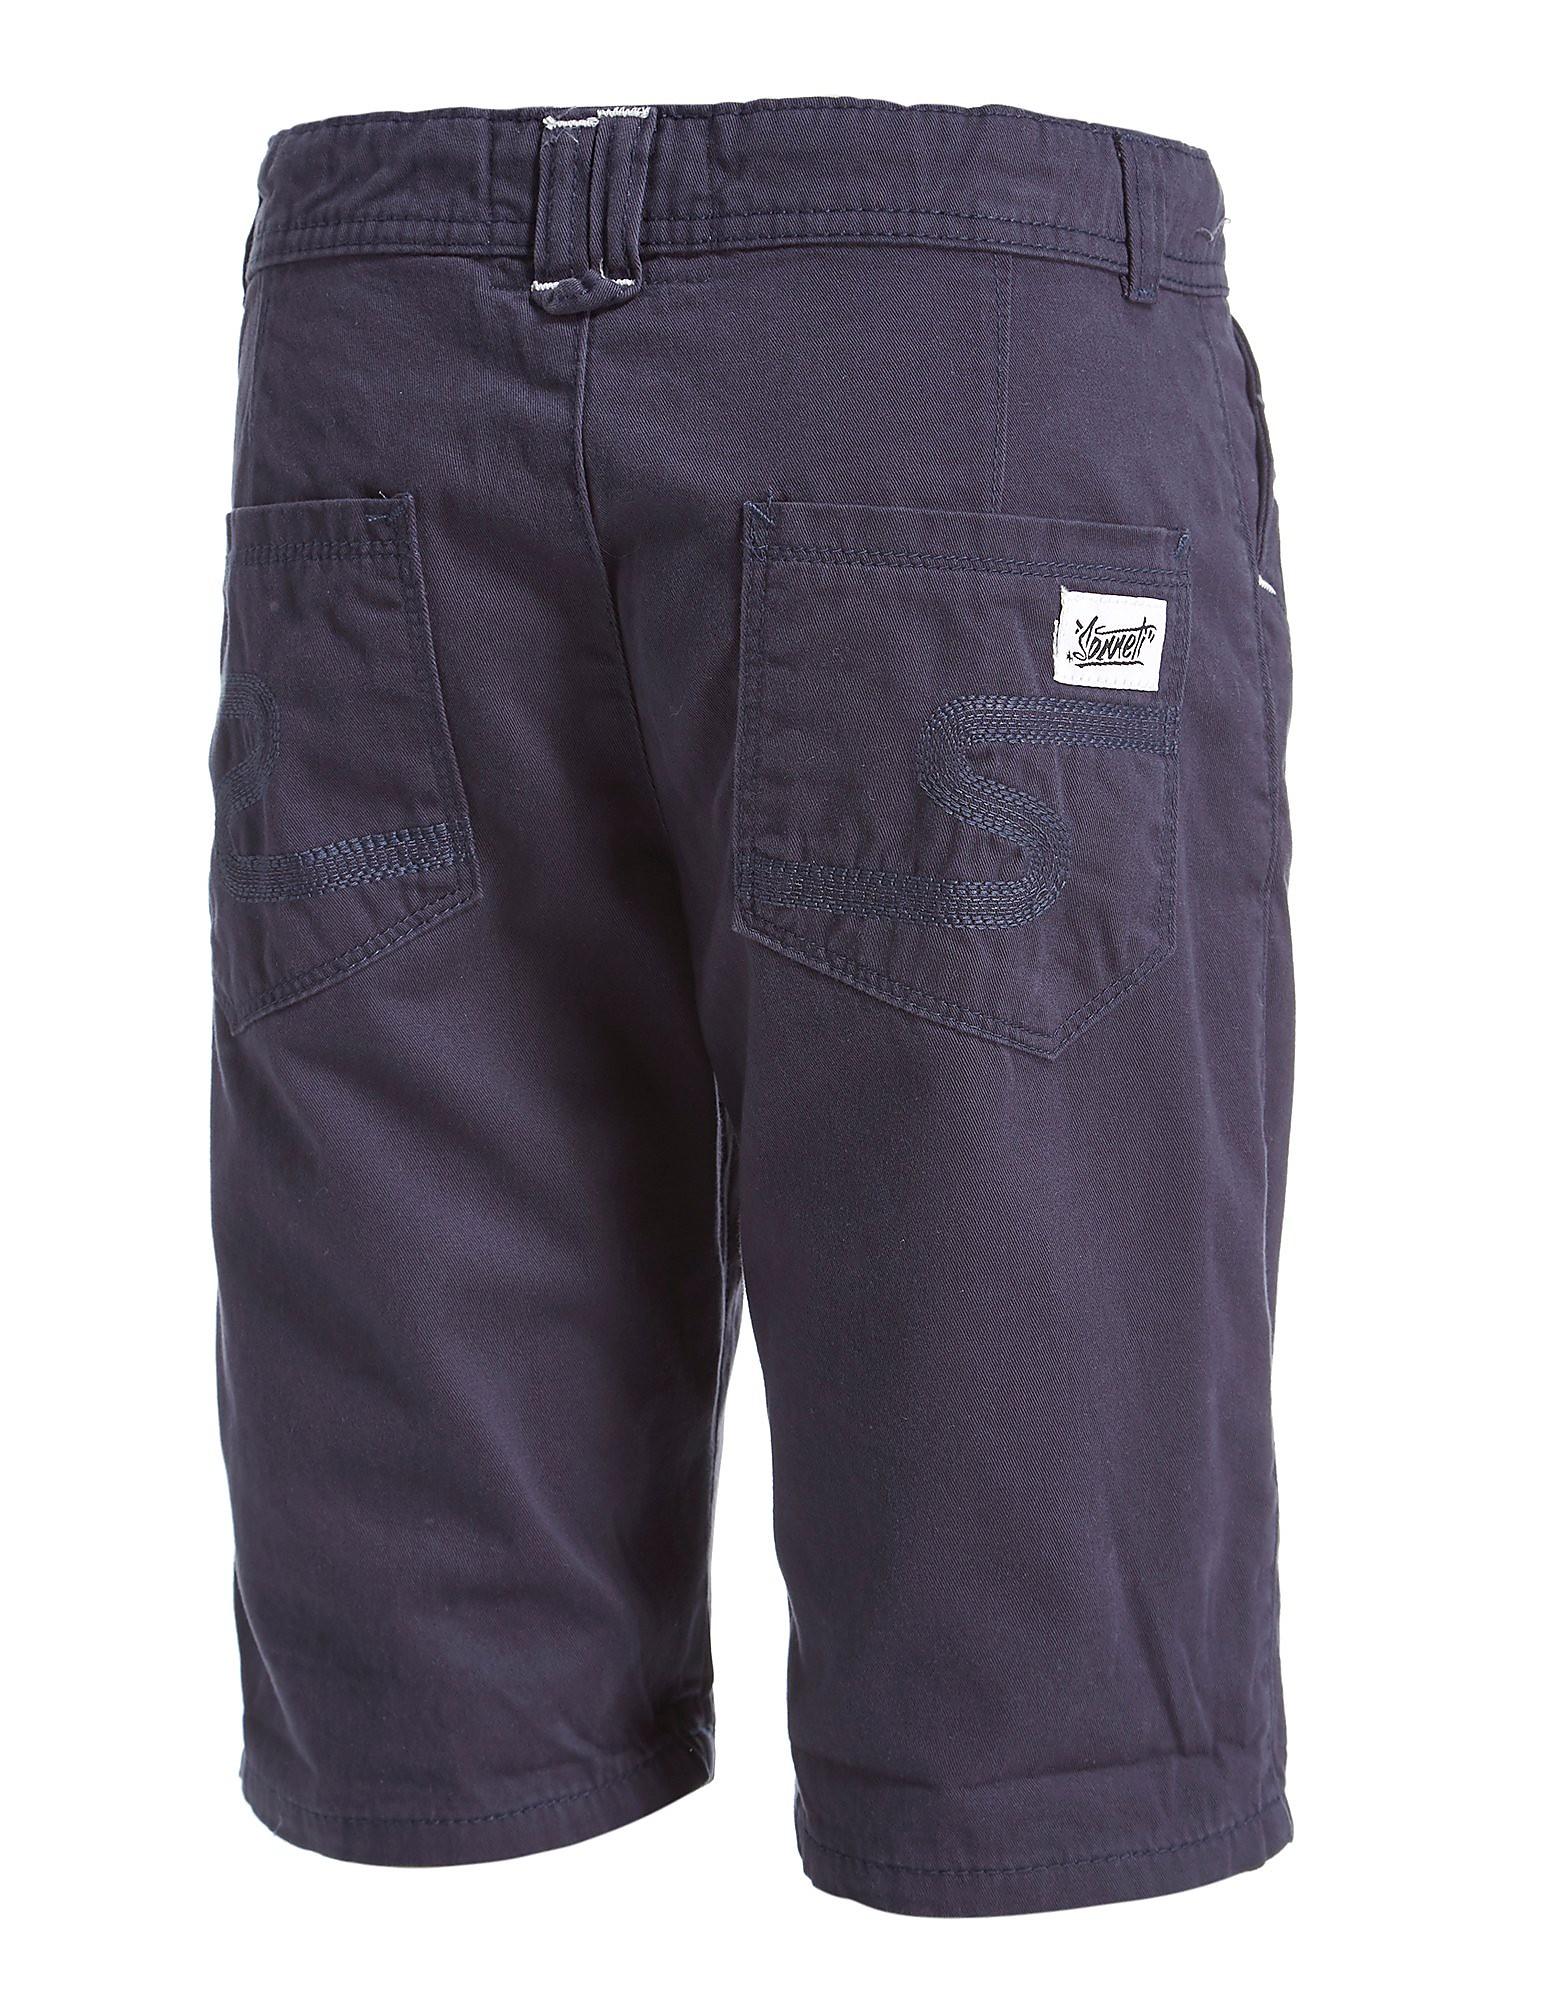 Sonneti Hades Chino Shorts Junior